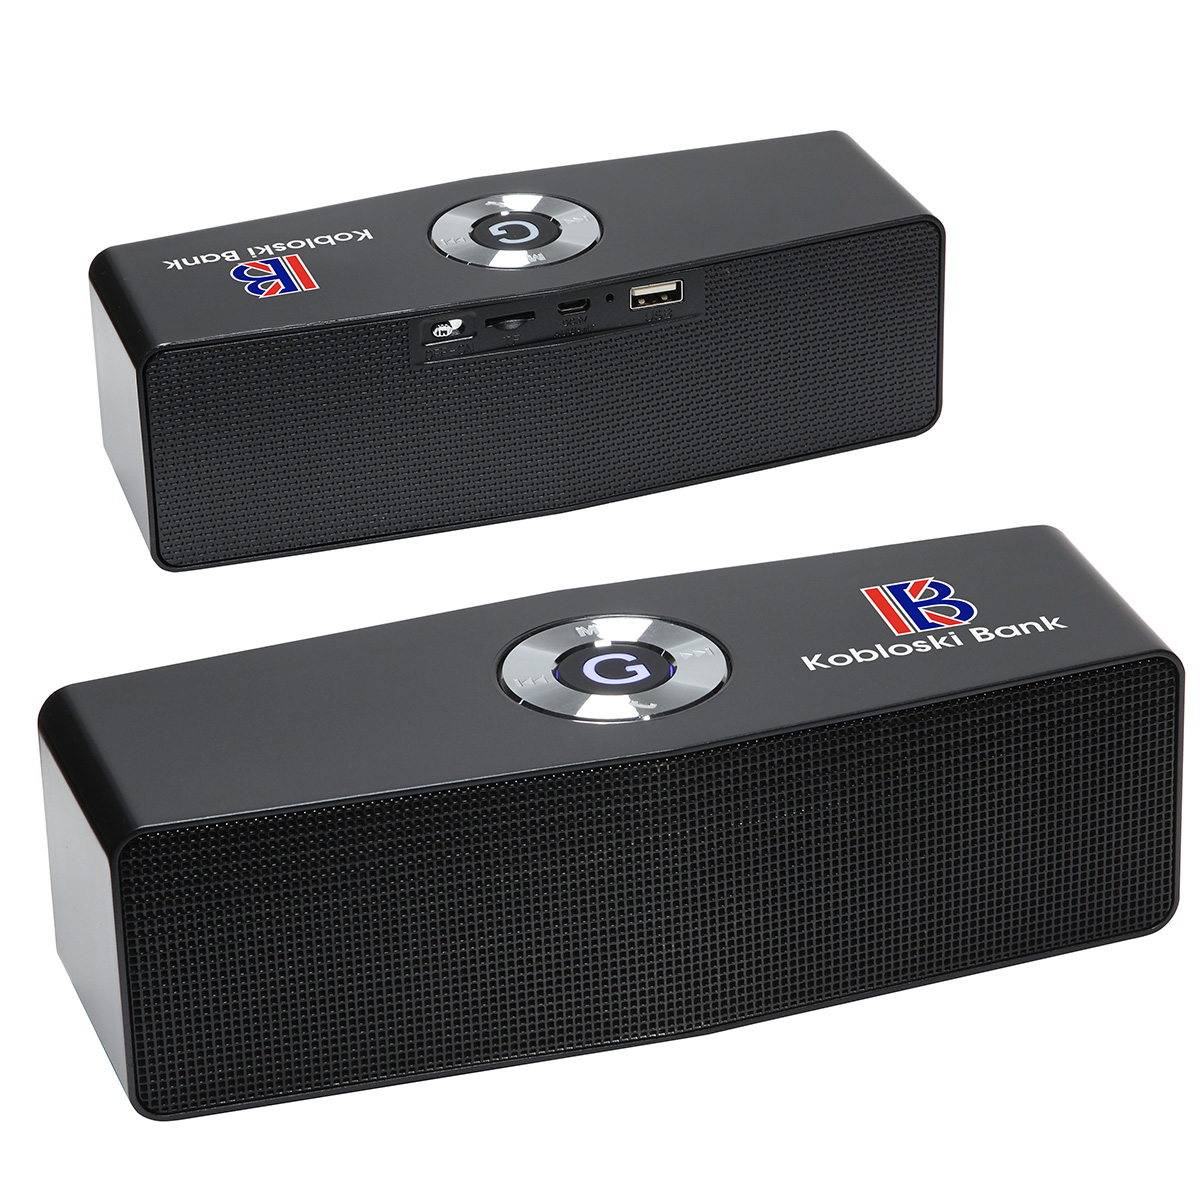 Groovy Wireless Speaker, ESP-AW18, 1 Colour Imprint